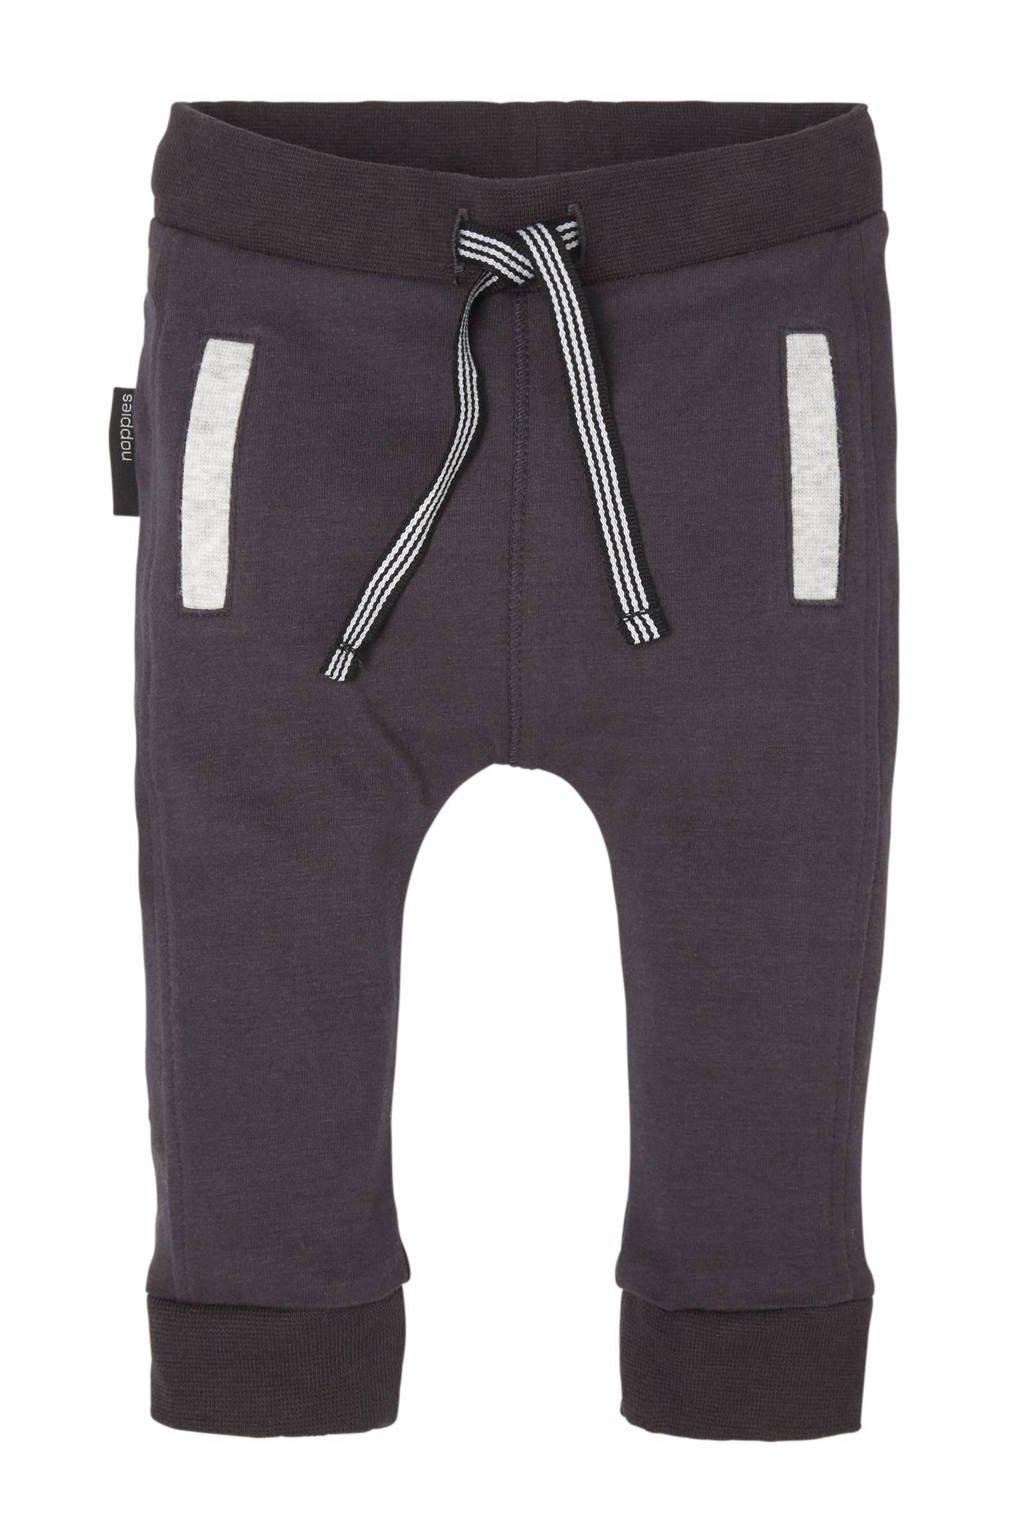 Noppies baby broek Wahpeton blauw, Donkerblauw/grijs